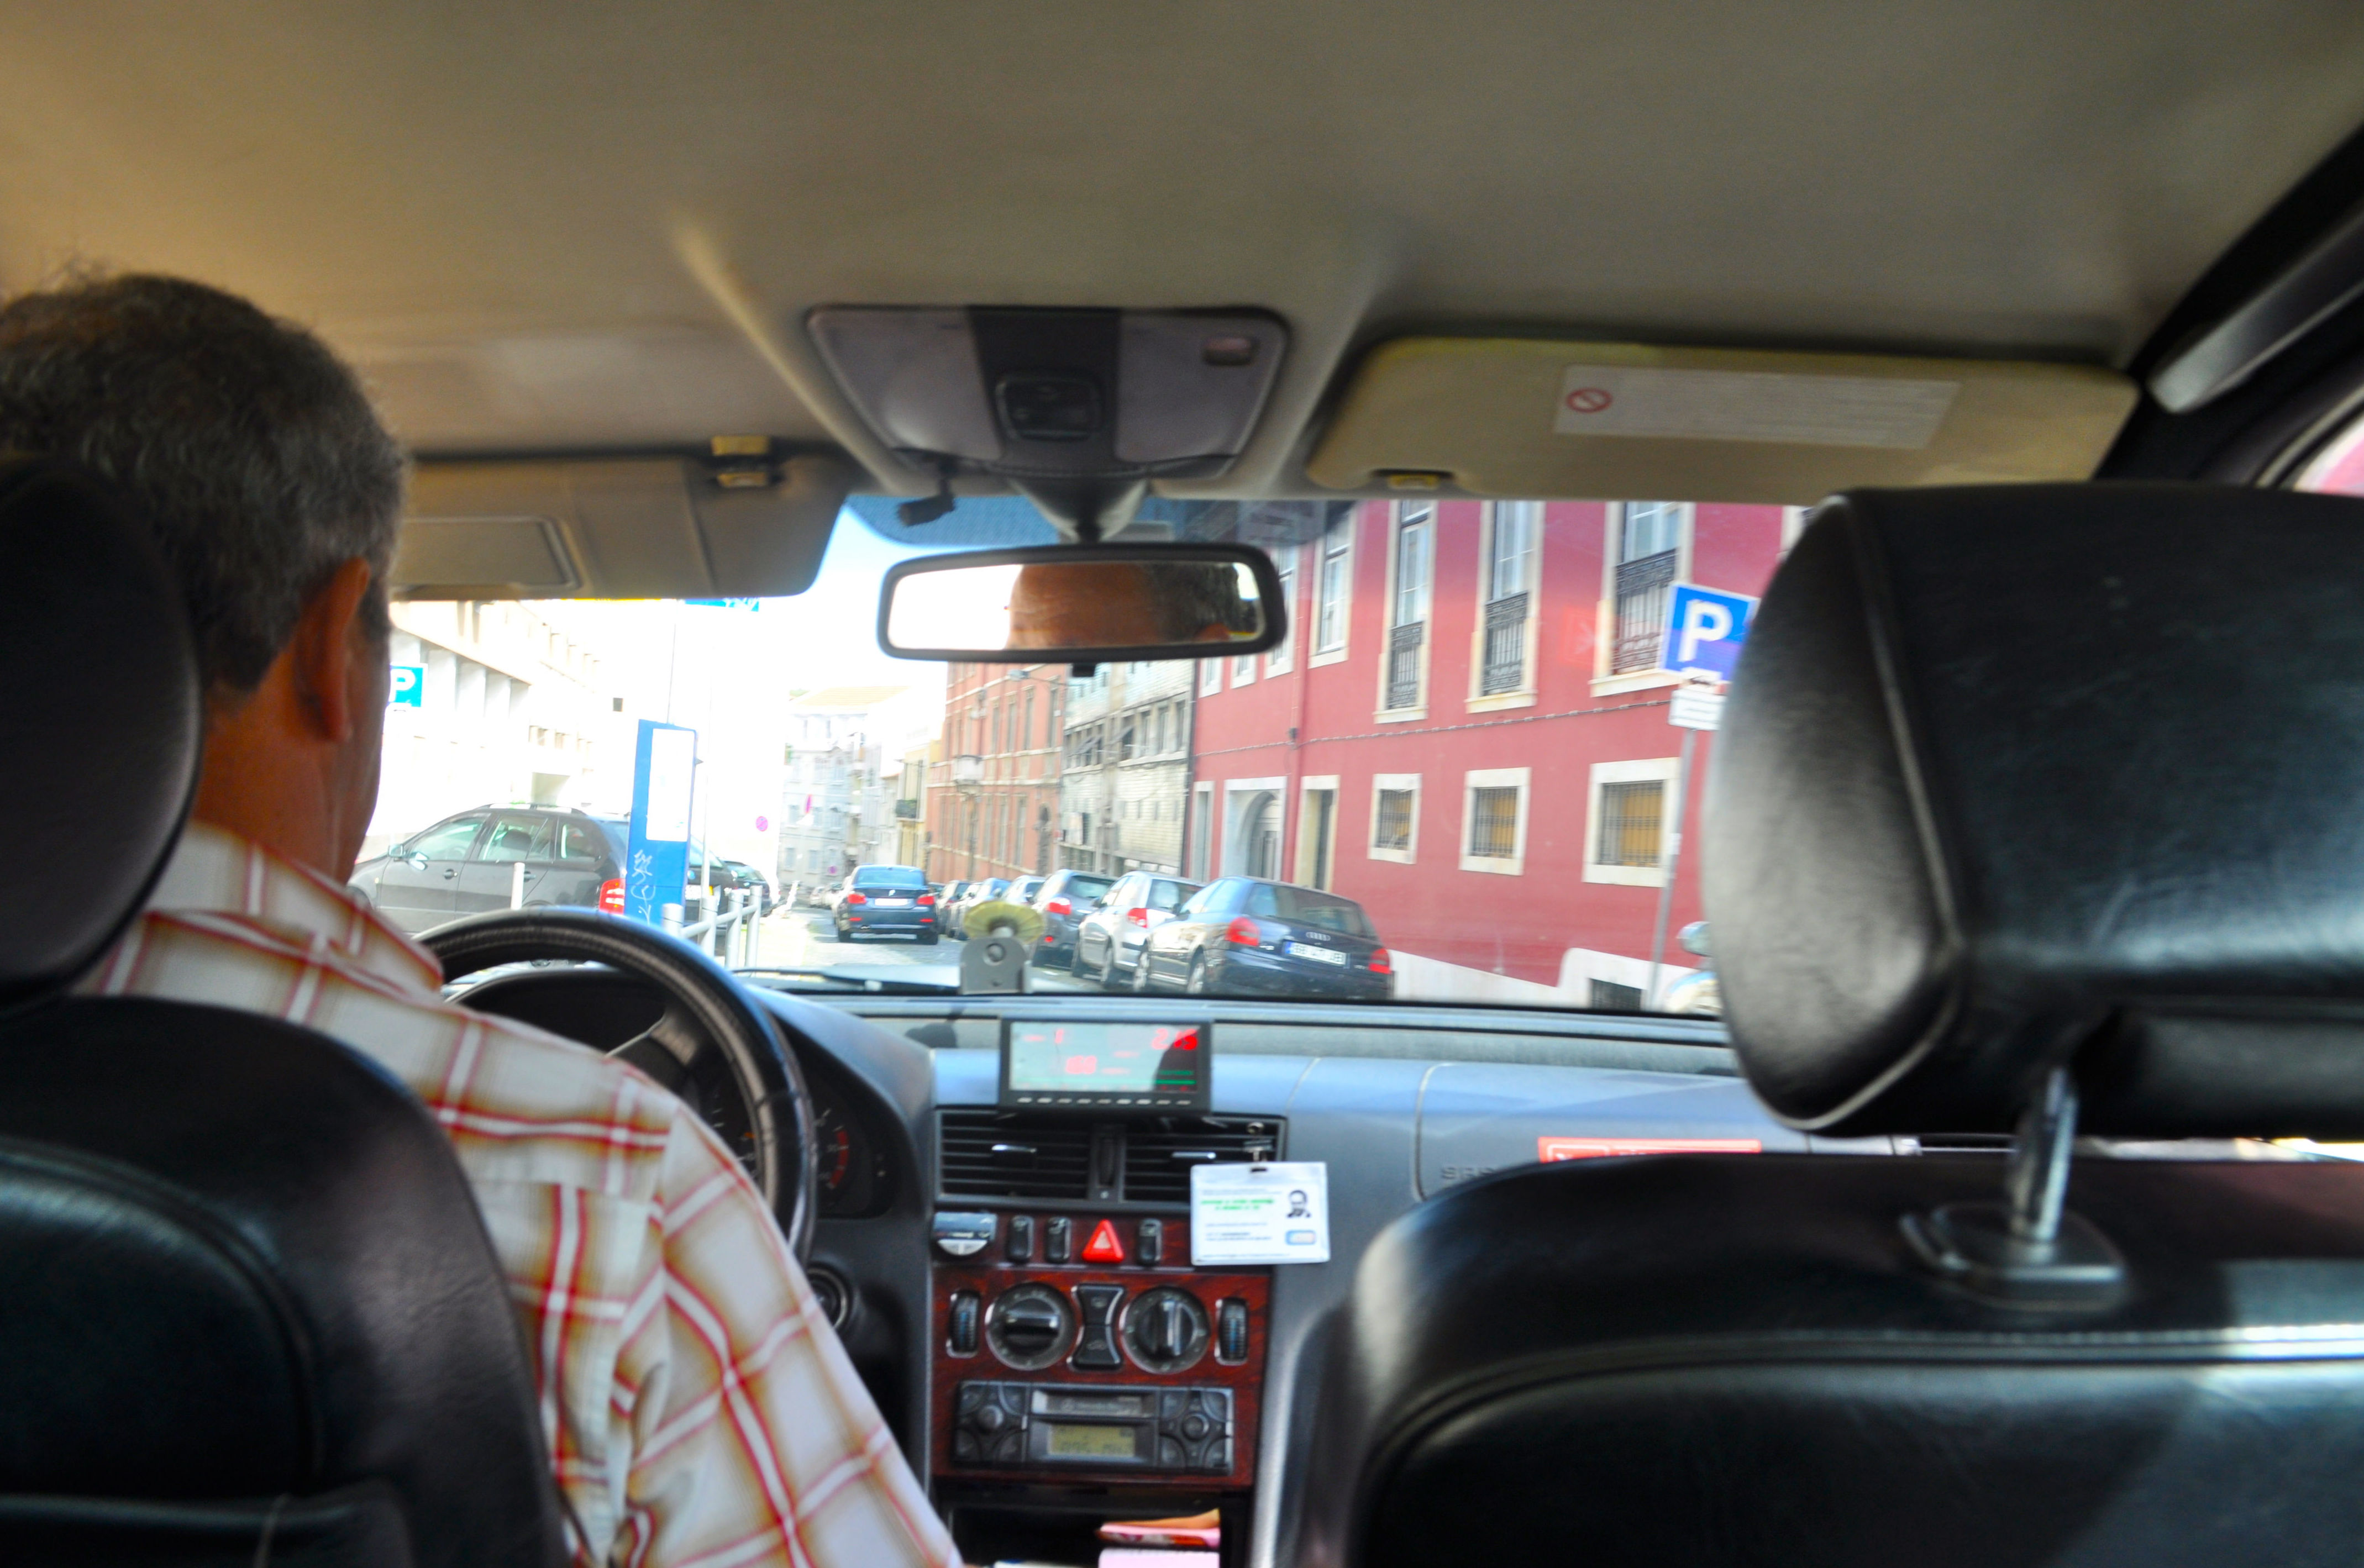 Servicio de taxi en Vitoria Gasteiz